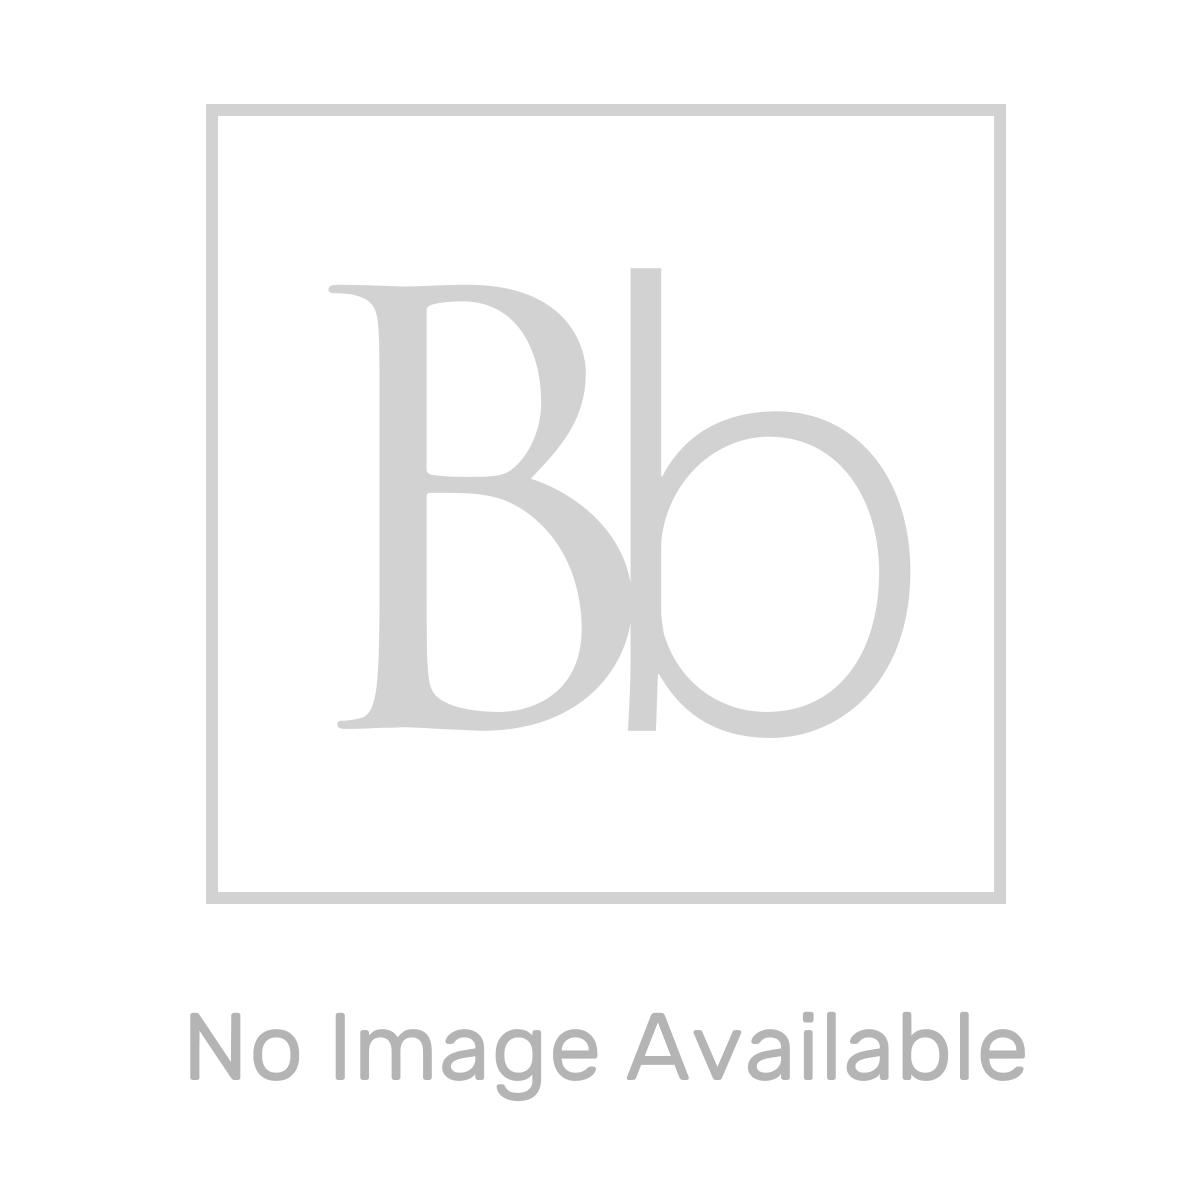 Aquadart Rectangular 1500 x 800 Shower Tray